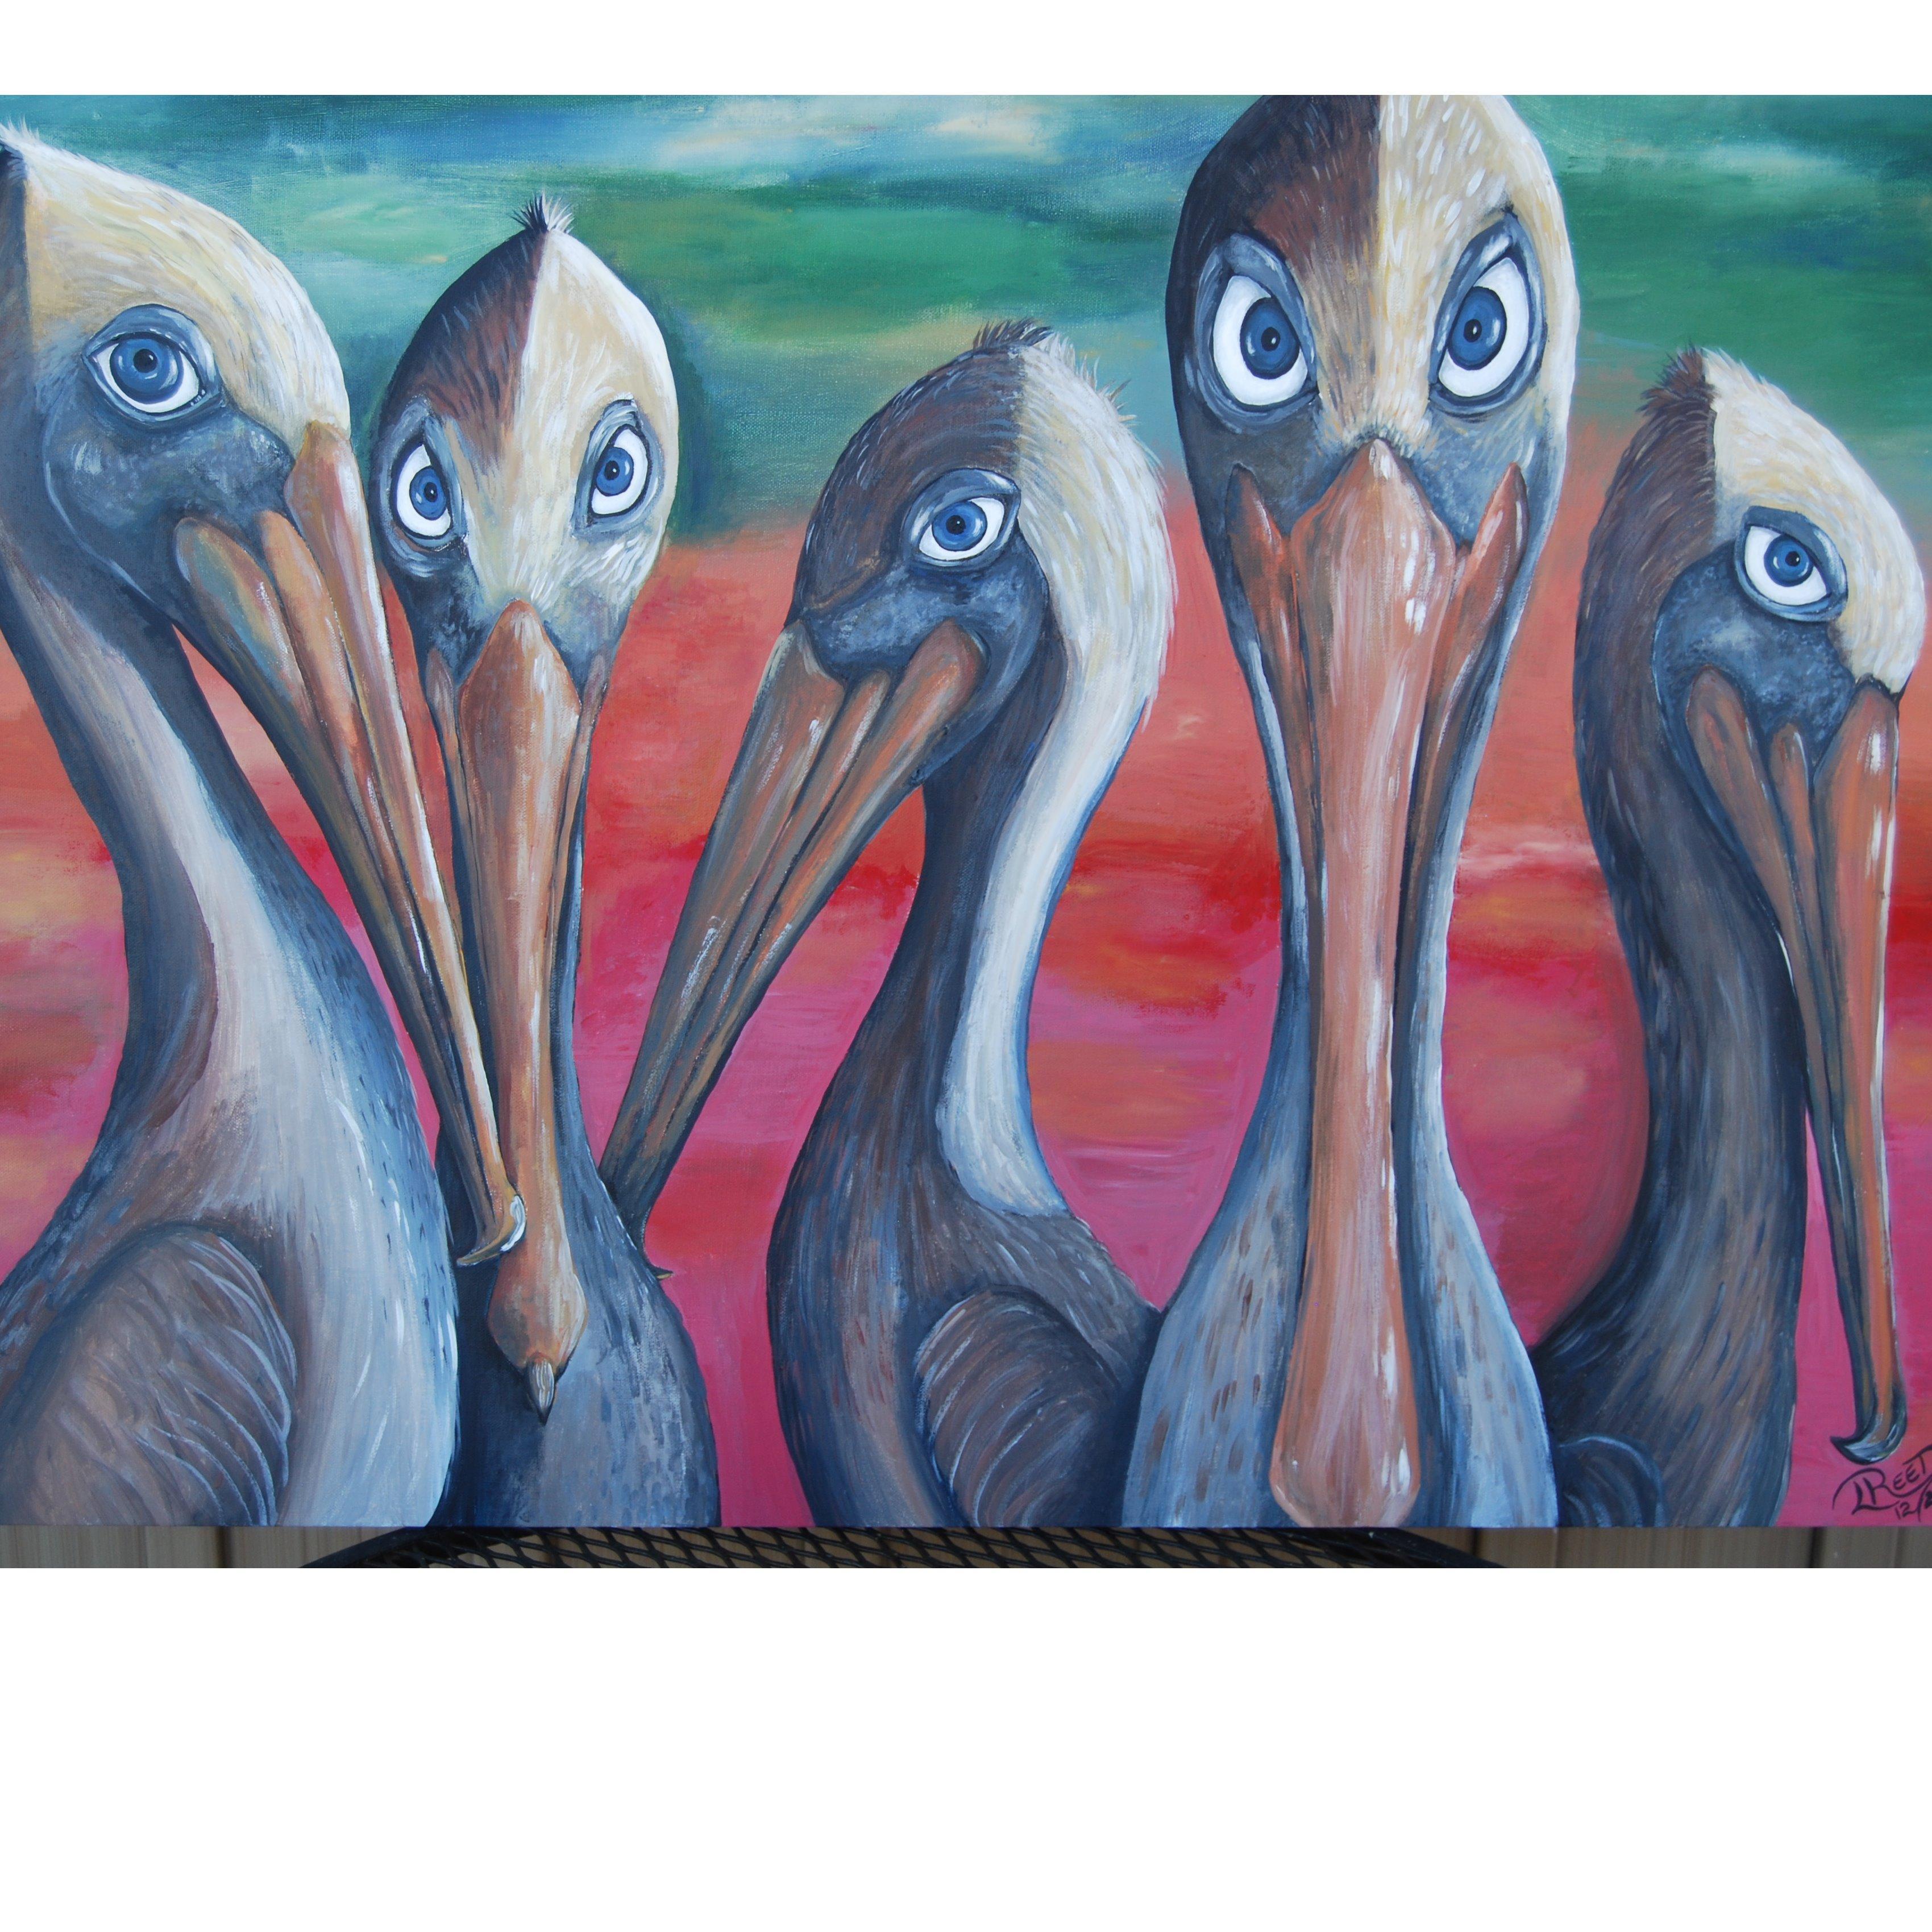 Flock of Five Gift and Art Emporium, LLC